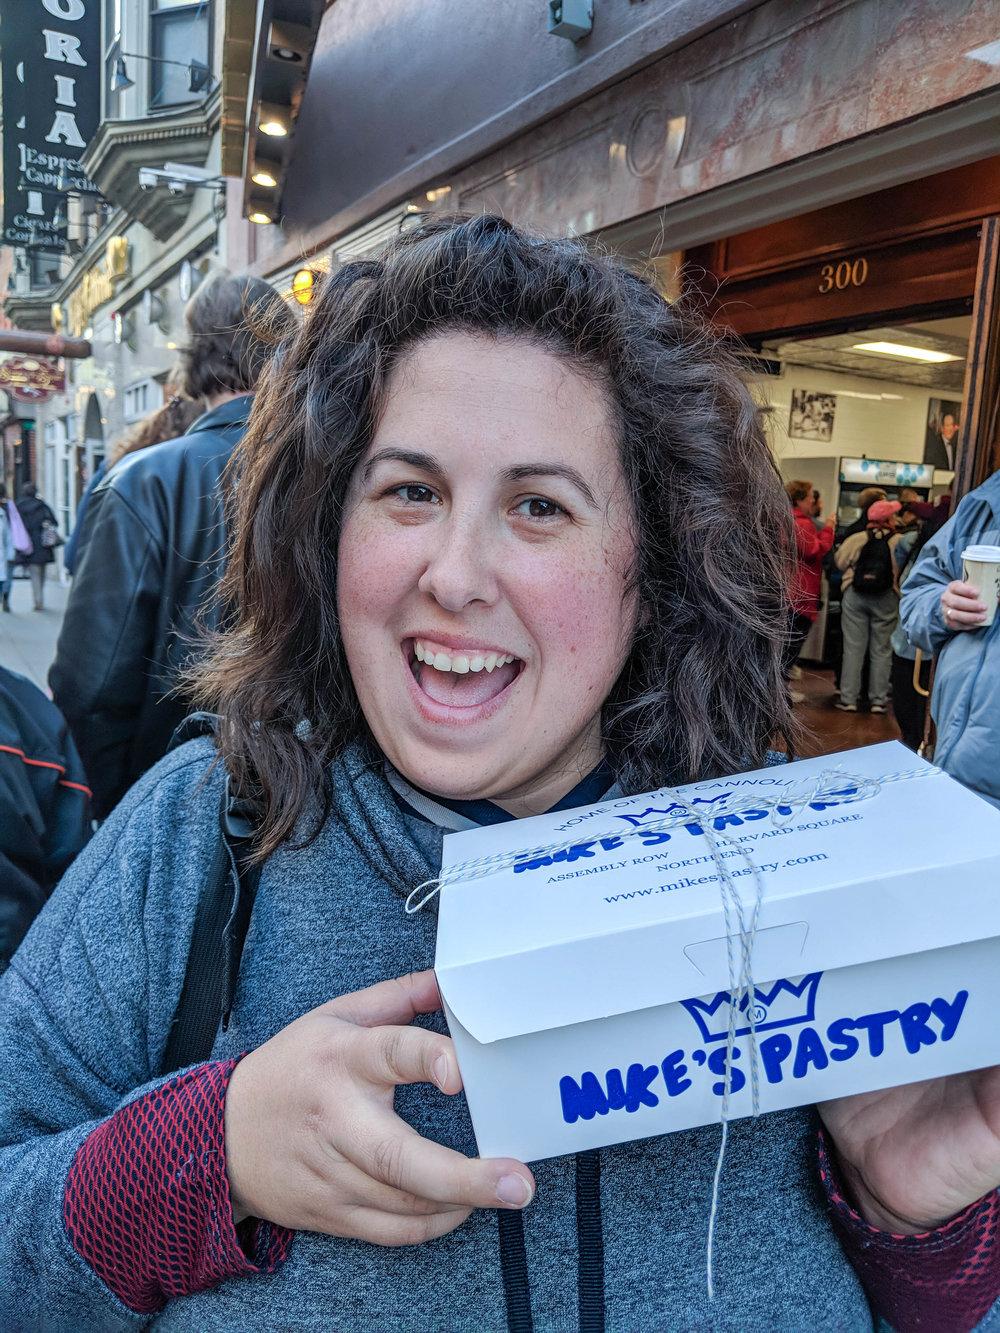 bri rinehart; photography; boston; mike's pastry; food